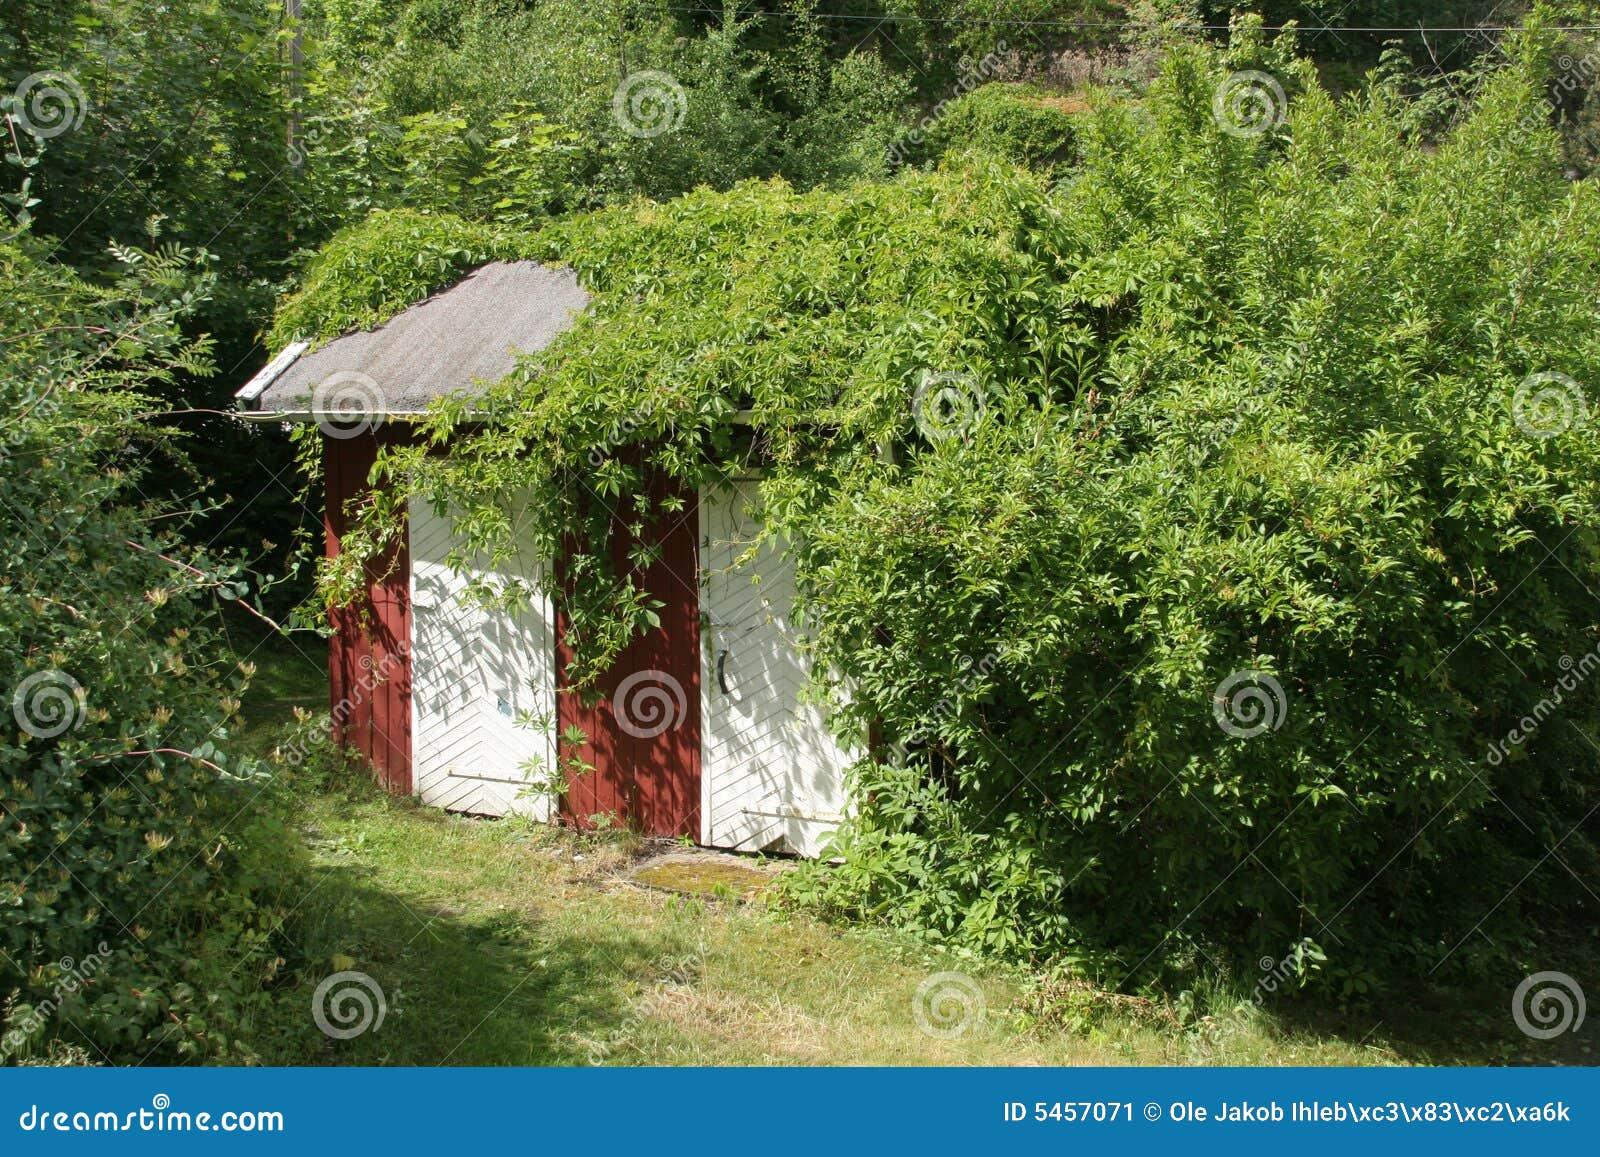 Little garden house - Little House In The Garden